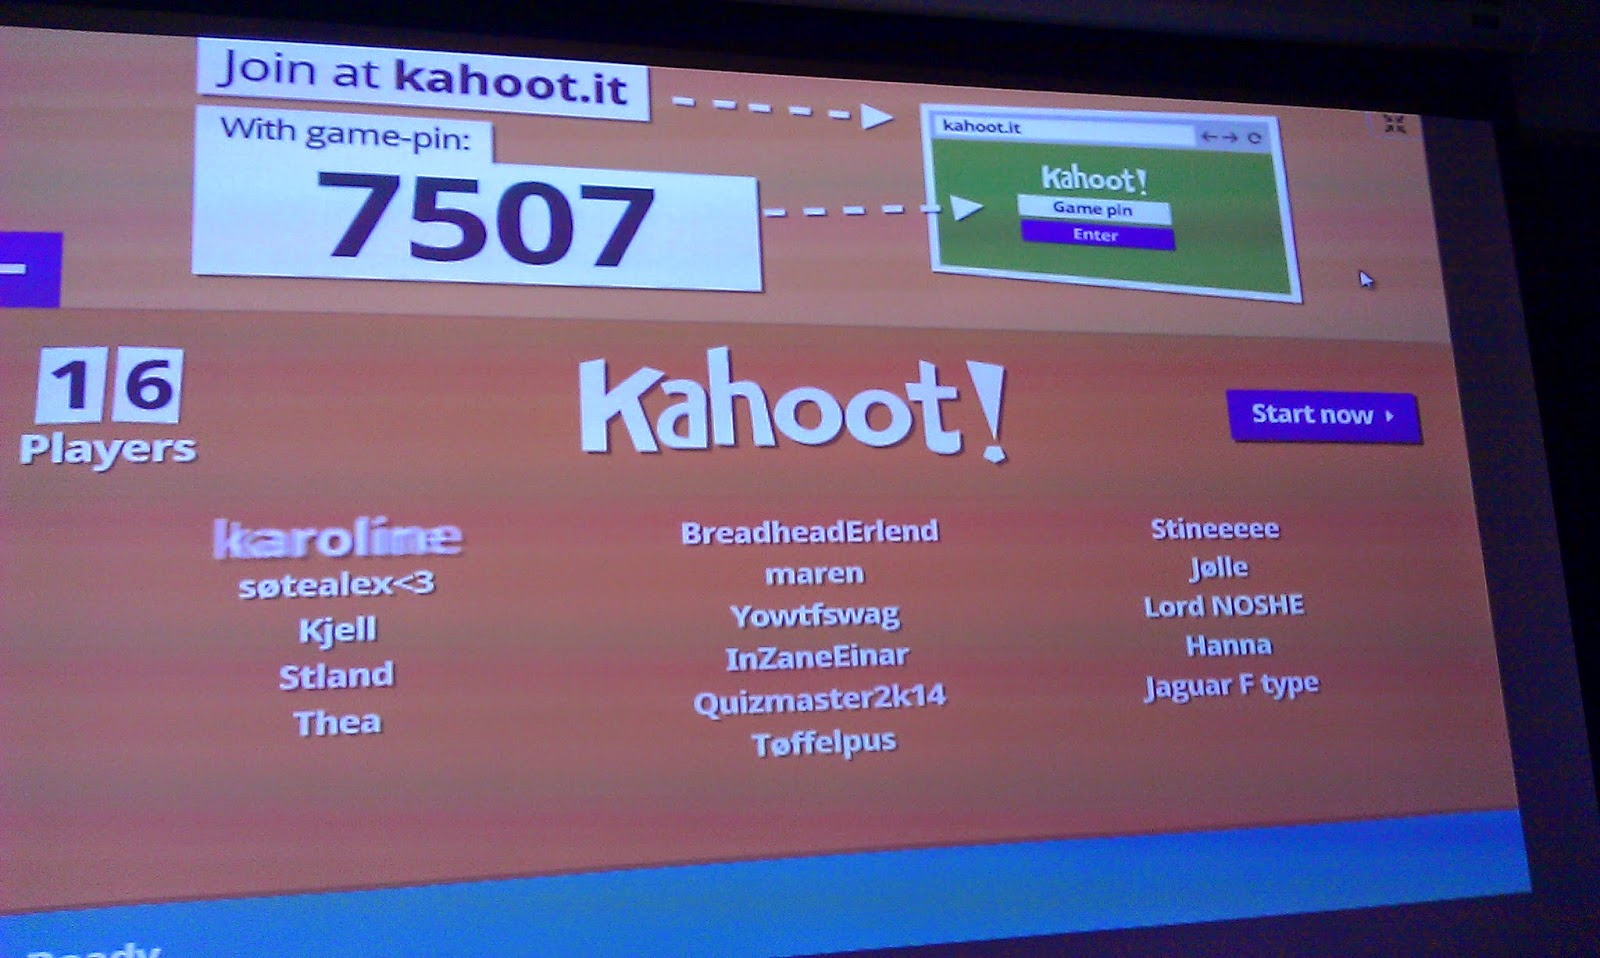 Cool kahoot names